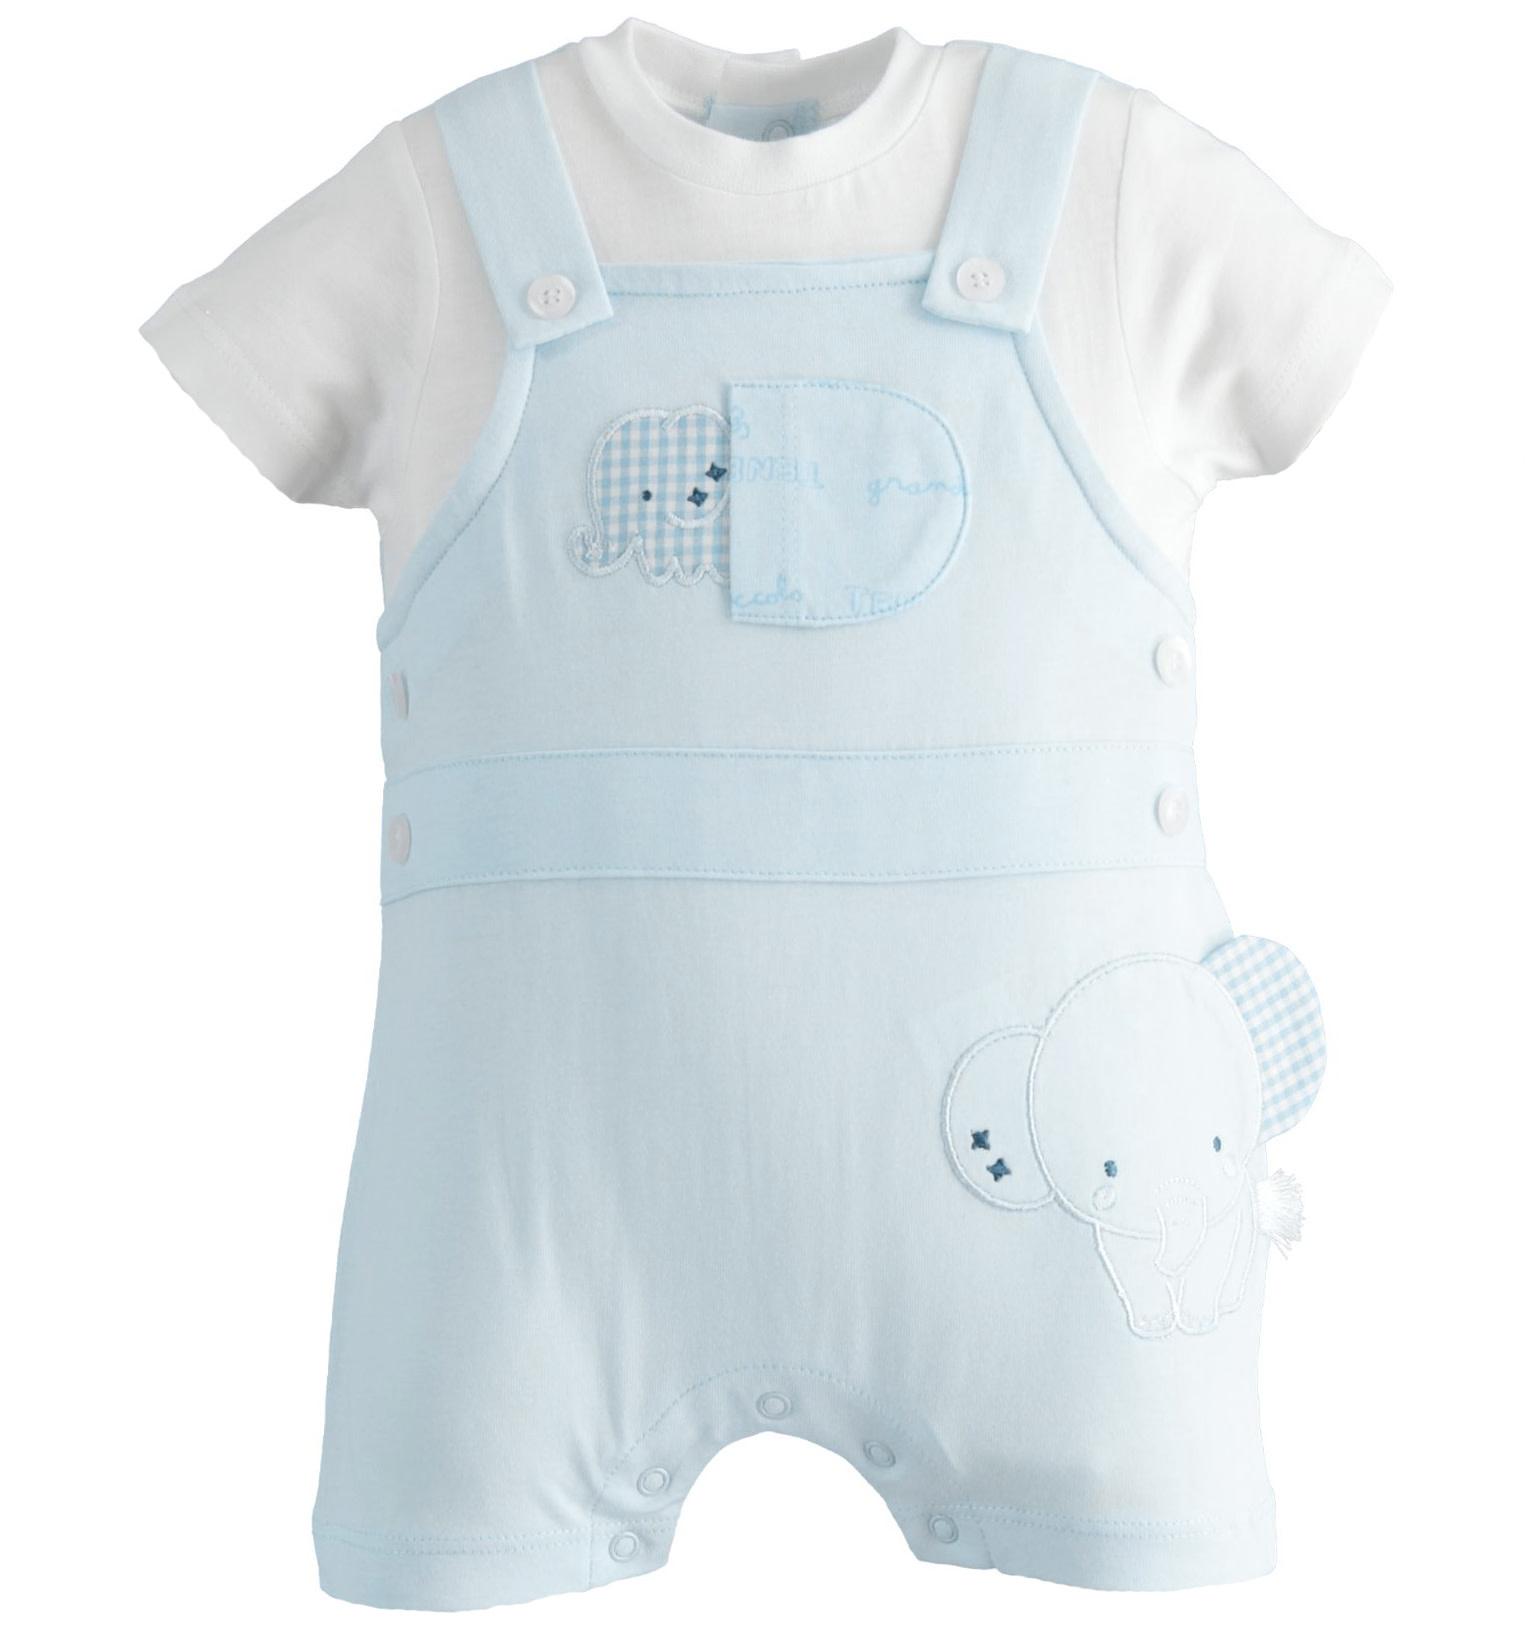 iDo iDO SS20 Baby Boys Blue  All in one elephant romper J080